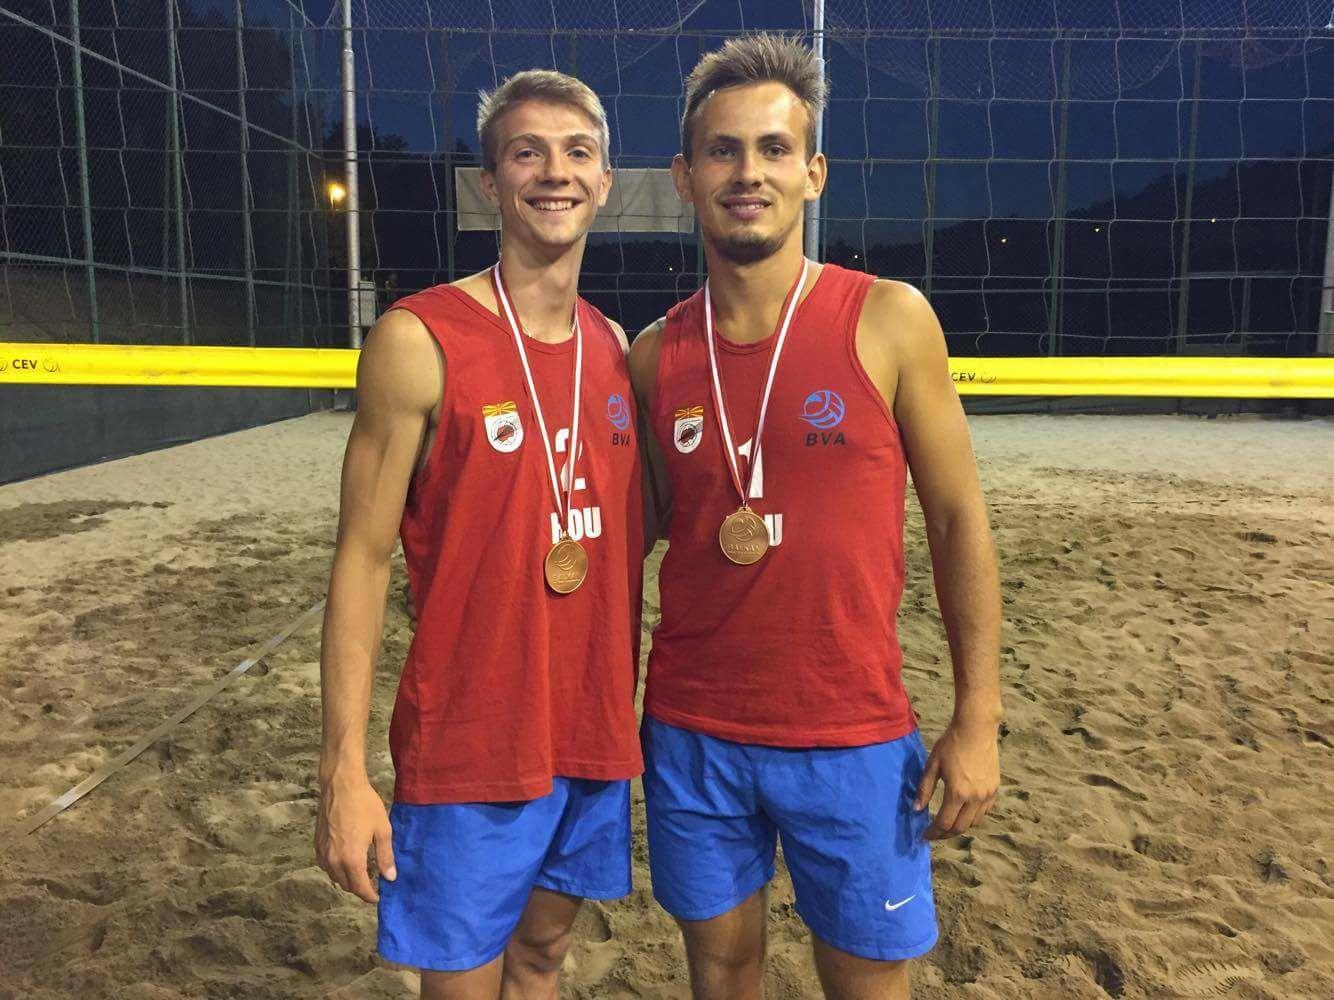 Medalie de bronz la Campionatul Balcanic Beach Volley U22 Macedonia